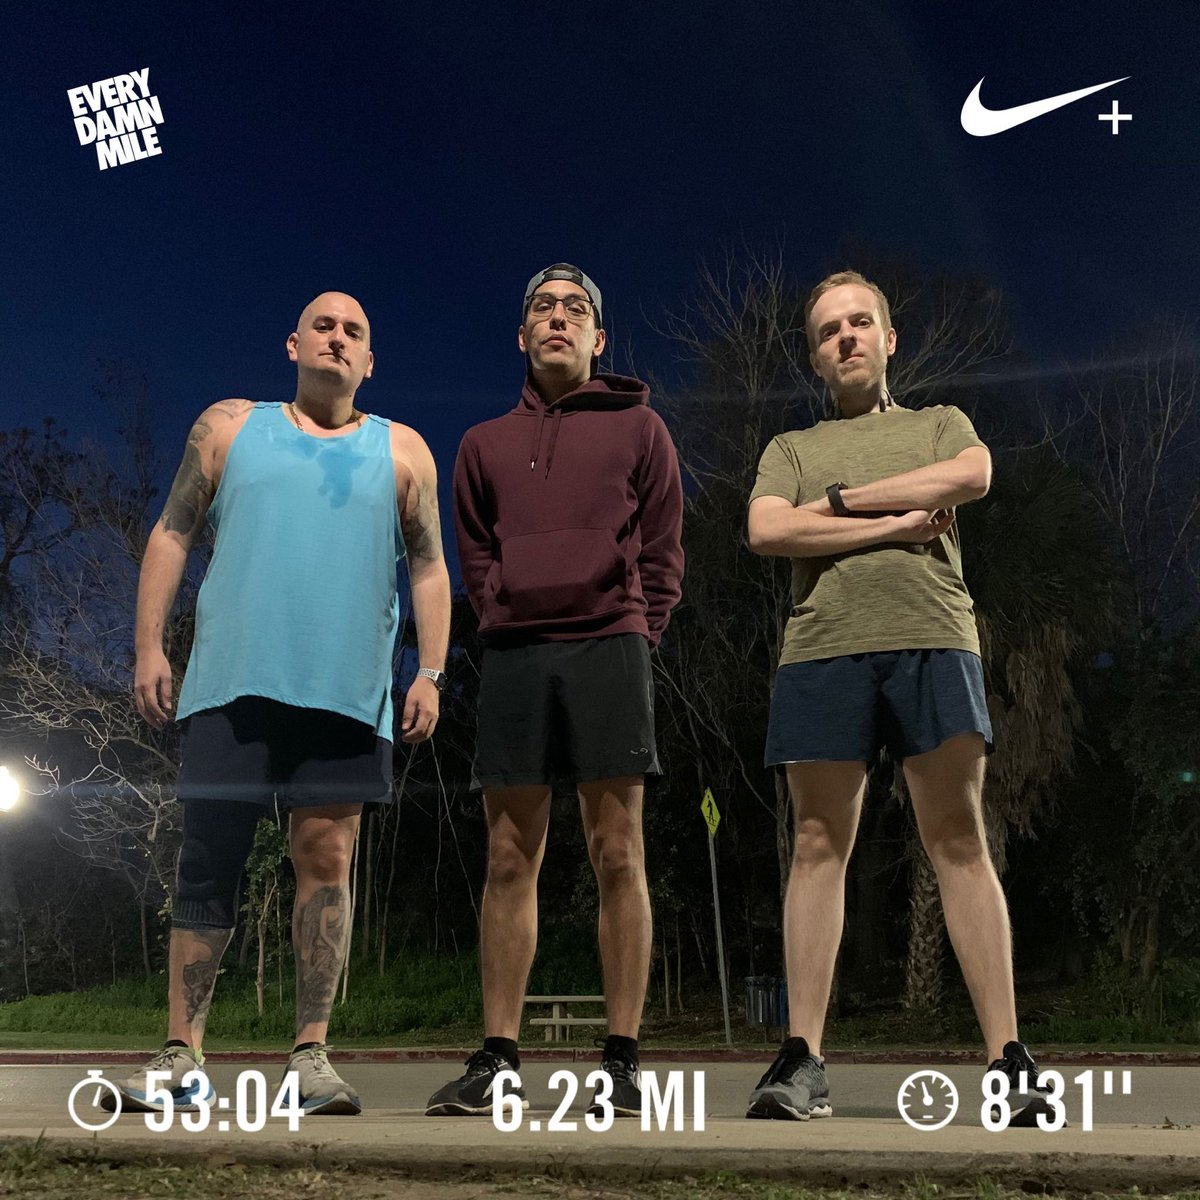 Ran 6.23 miles with Nike Run Club... 10k all week... had to be mentally discipline to get it done...  #hokaoneone #hokaoneonecarbonx #carbonx #carbonxtotheworld #nrc #nikerunclub #sanantonio #satx  #elhijodebarrio #mileaftermile #everydamnmile #dontstop  #sanantoniozoo #zoorunpic.twitter.com/hG64uvCAjZ